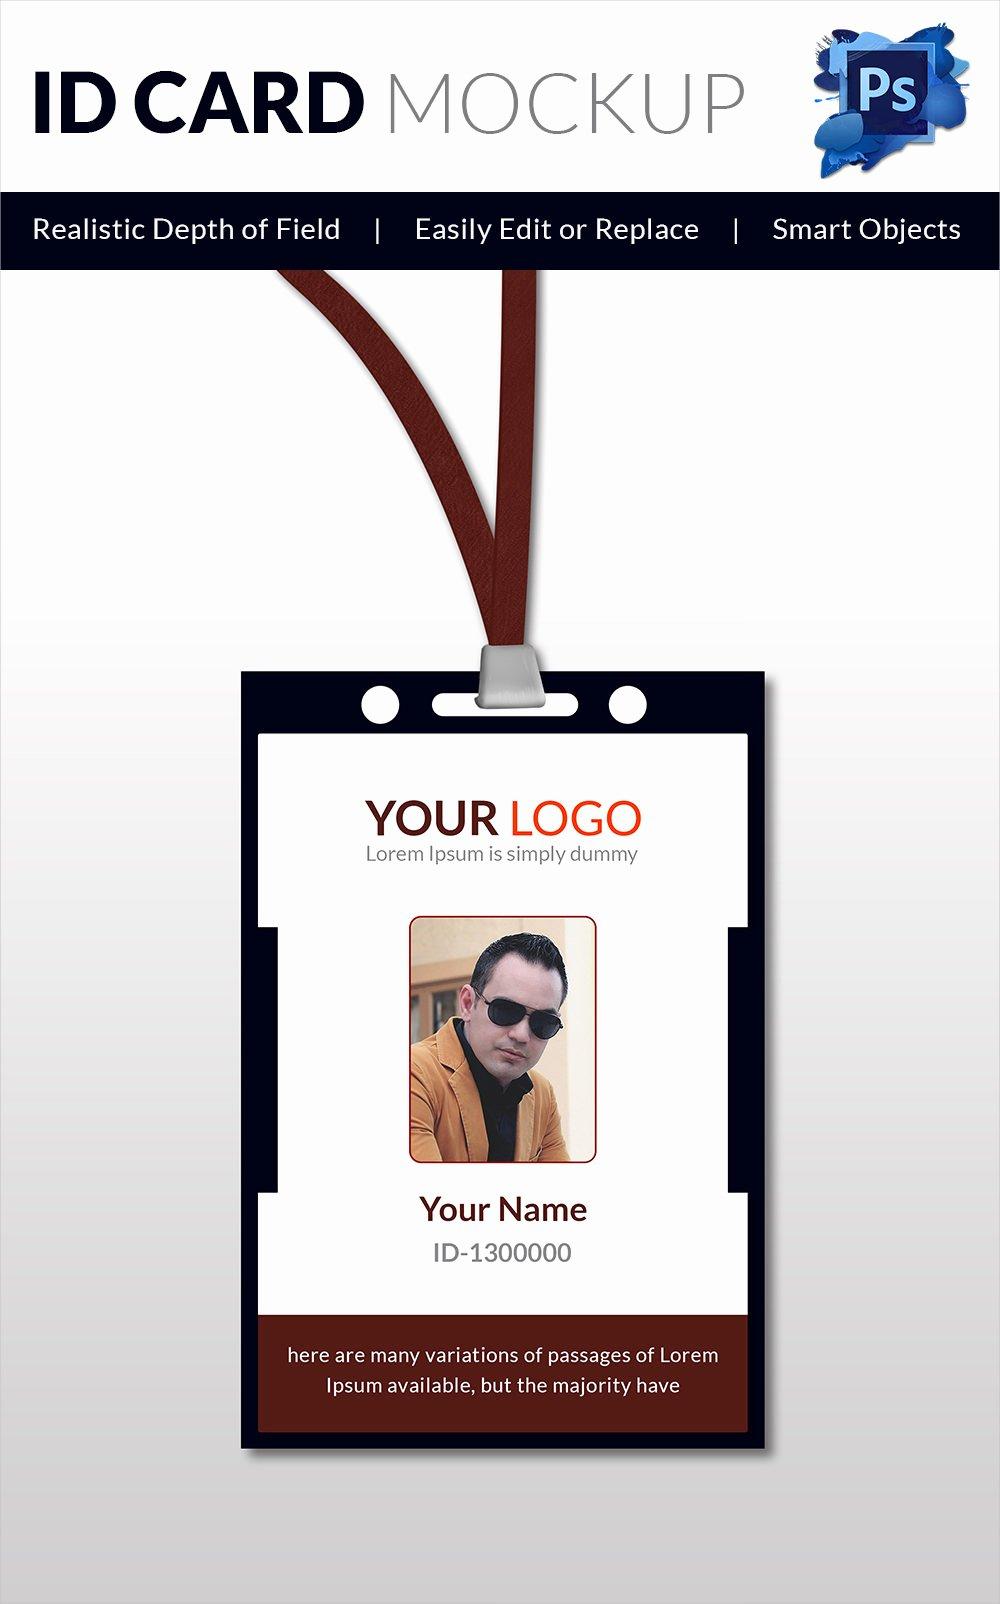 Id Card Template Word Elegant 30 Blank Id Card Templates Free Word Psd Eps formats